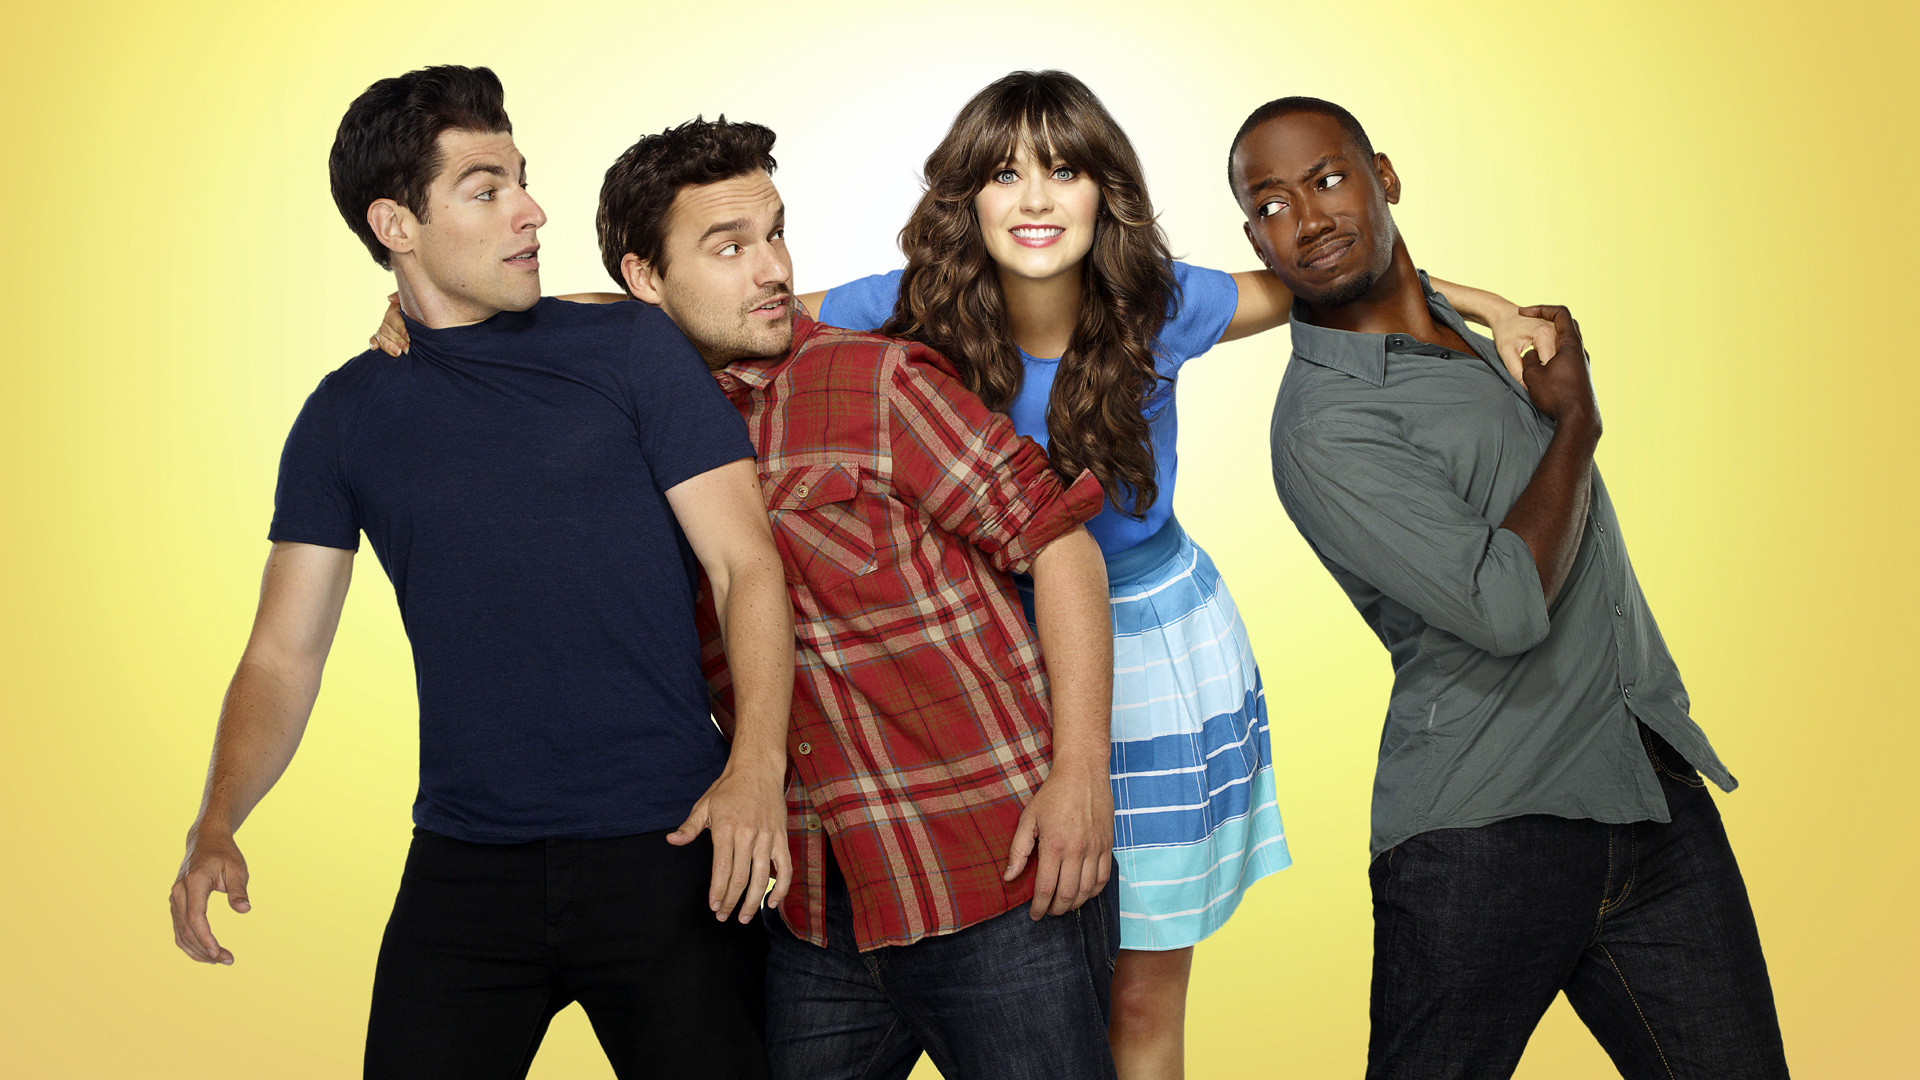 I hated my best friend when she got a boyfriend - BBC Three